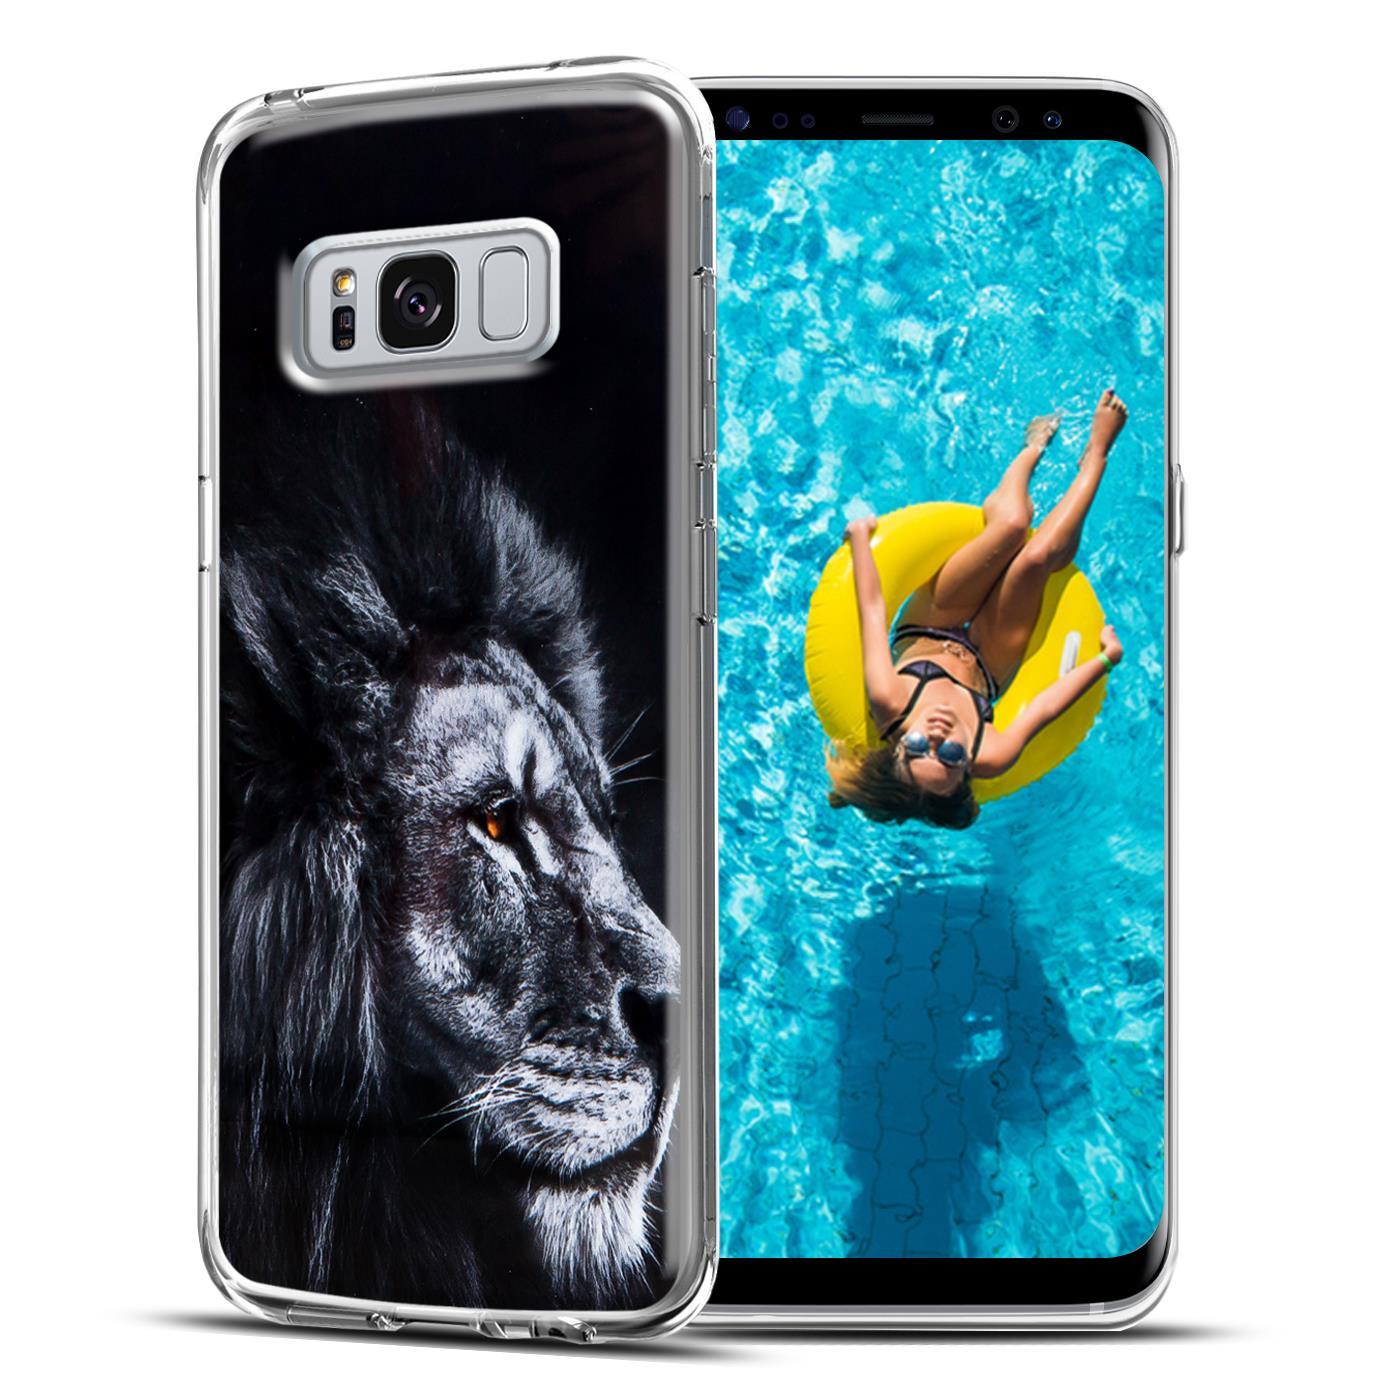 Handy-Huelle-fuer-Samsung-Galaxy-Schutzhuelle-TPU-Silikon-Backcover-Case-Slim-Motiv